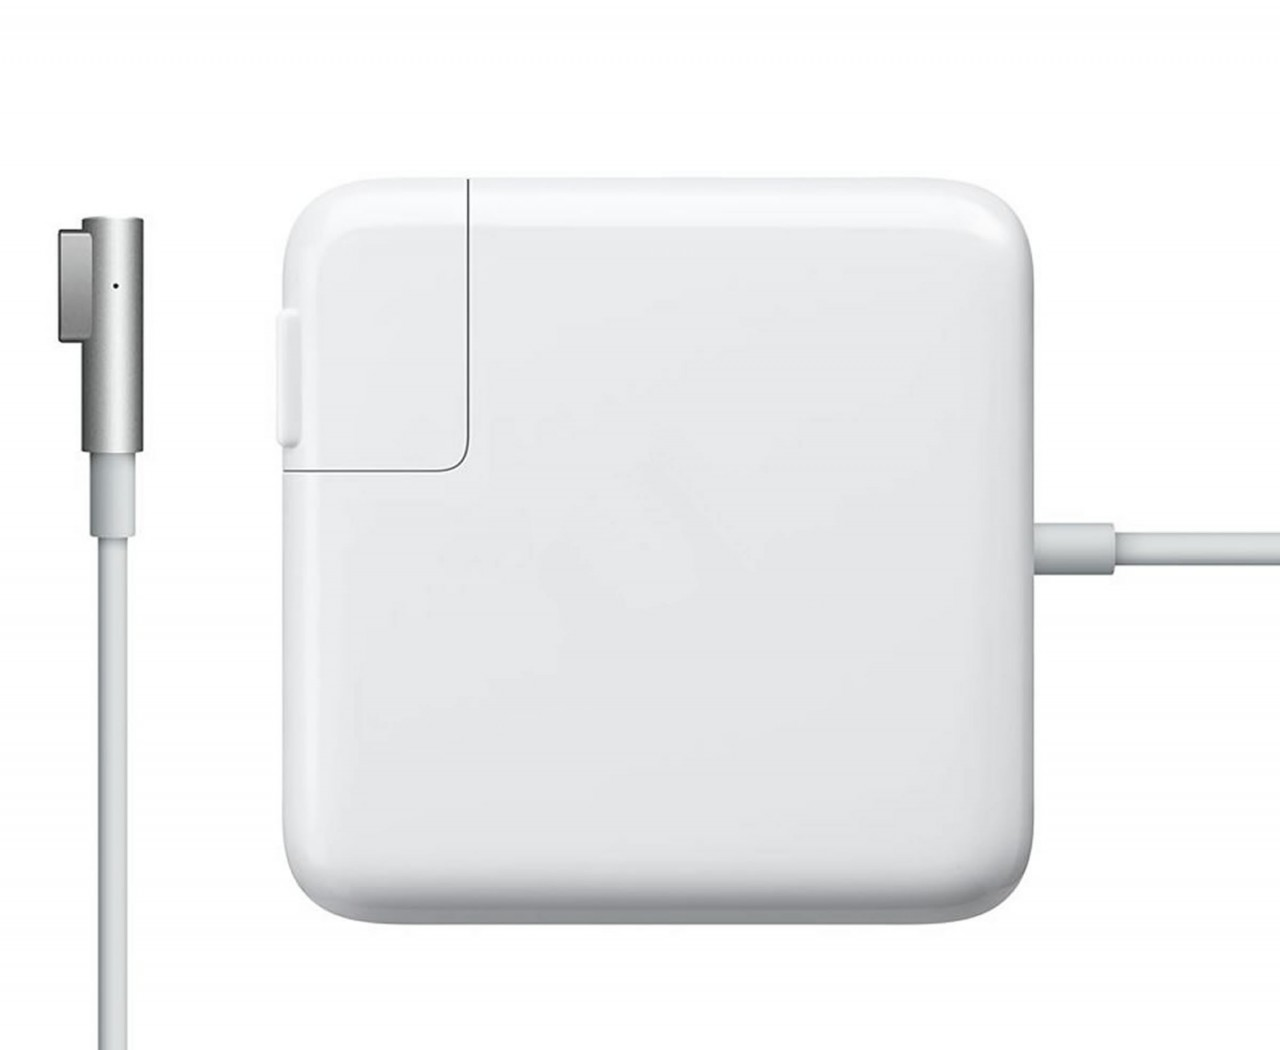 Incarcator Apple MacBook A1278 imagine powerlaptop.ro 2021